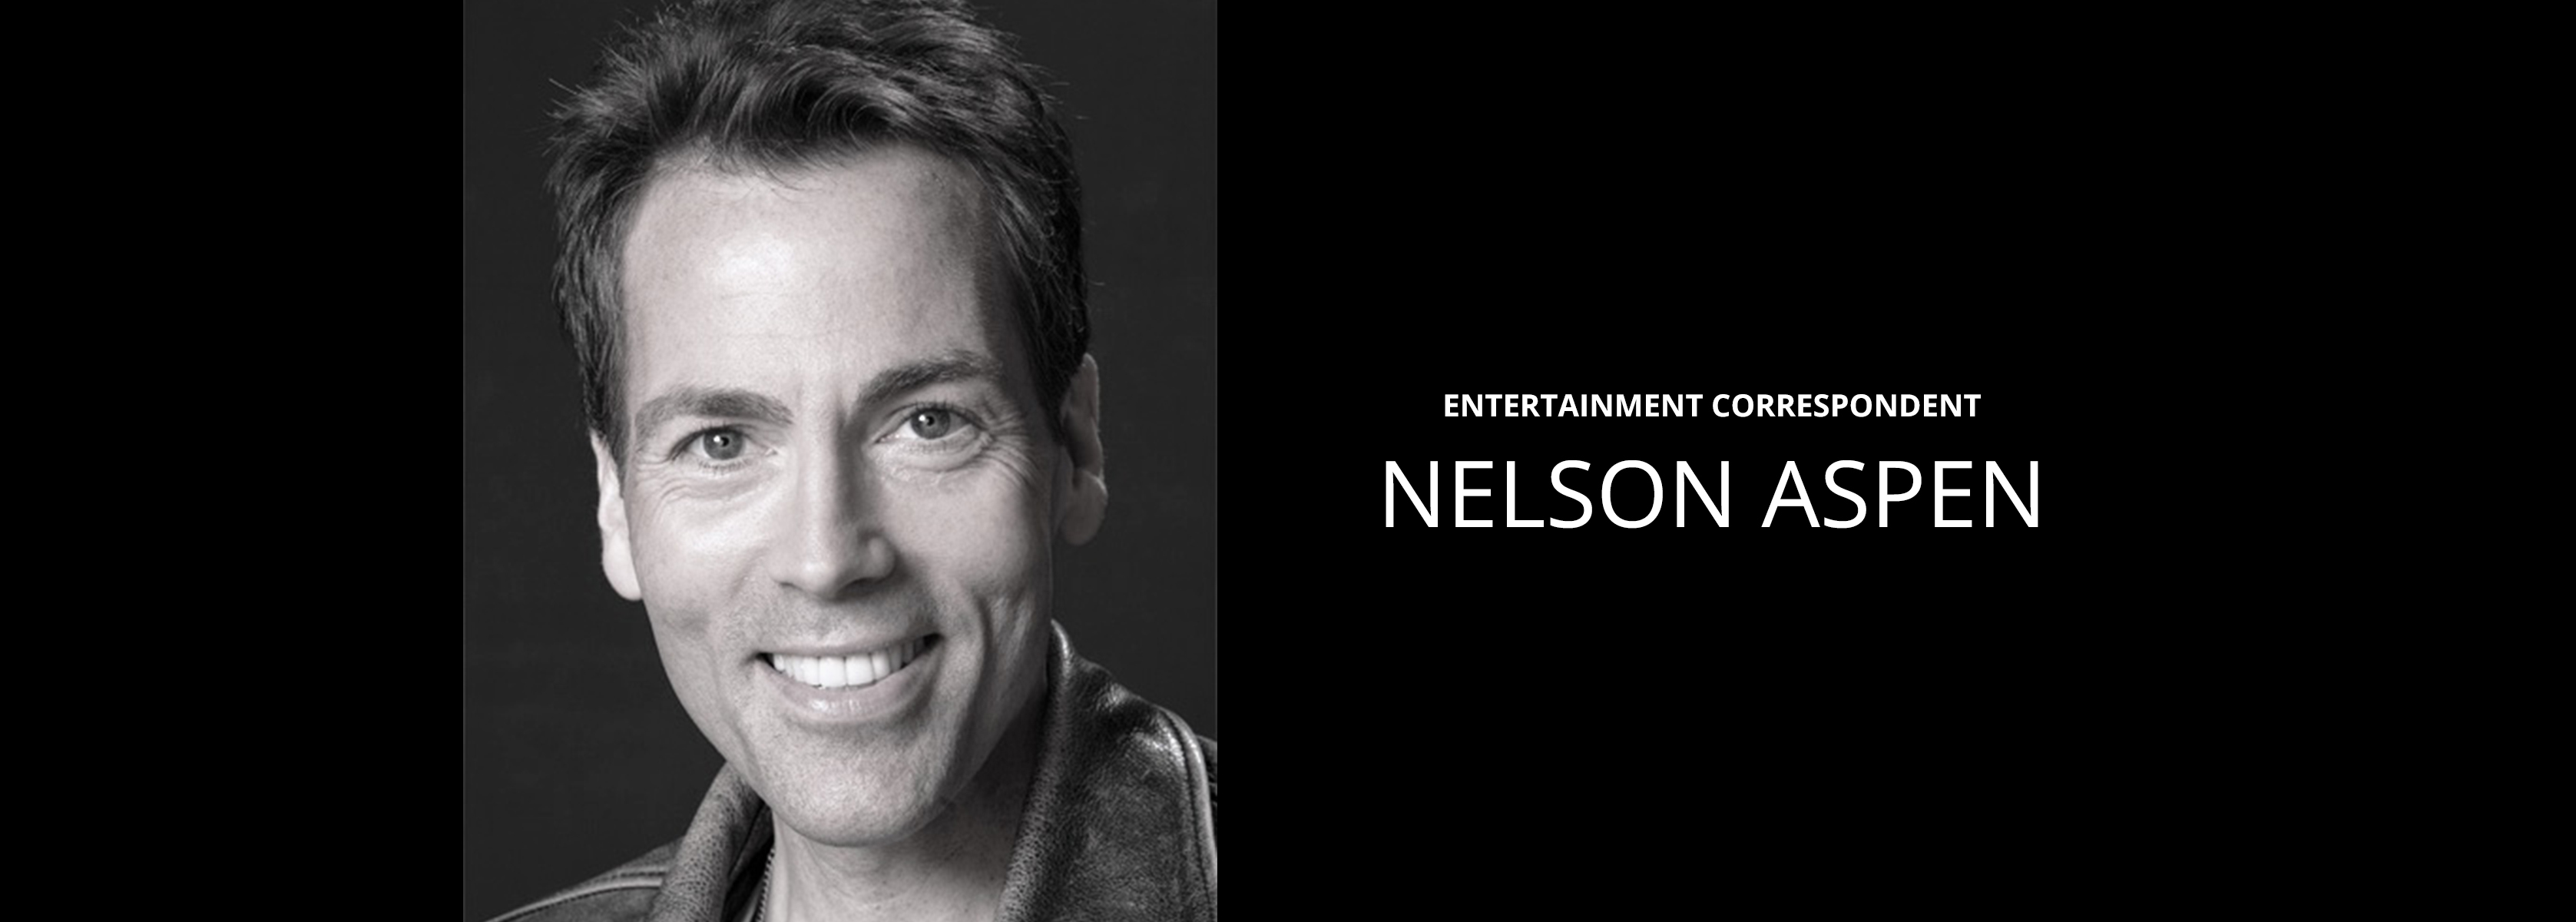 Nelson Aspen - Entertainment Correspondent - Bravo Talent Management